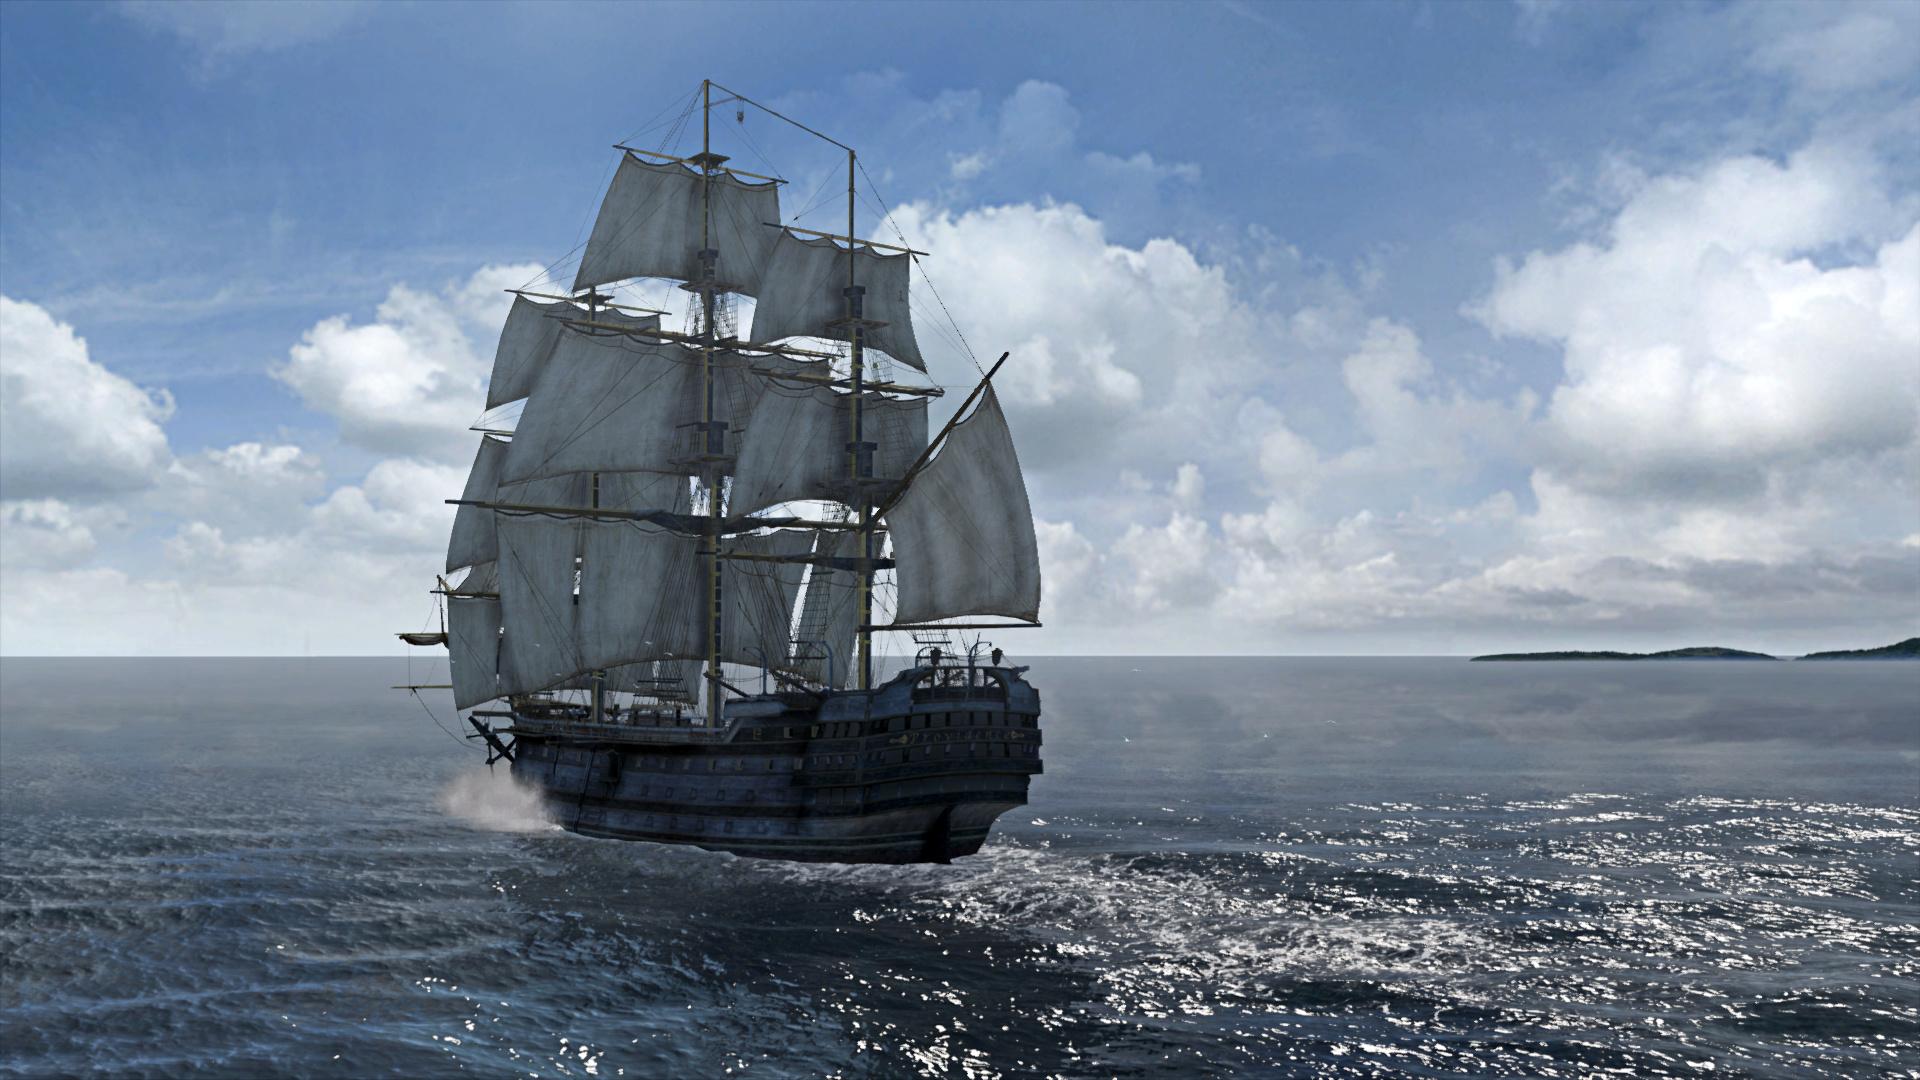 AC3SP 2018-12-12 21-02-51-47.jpg - Assassin's Creed 3